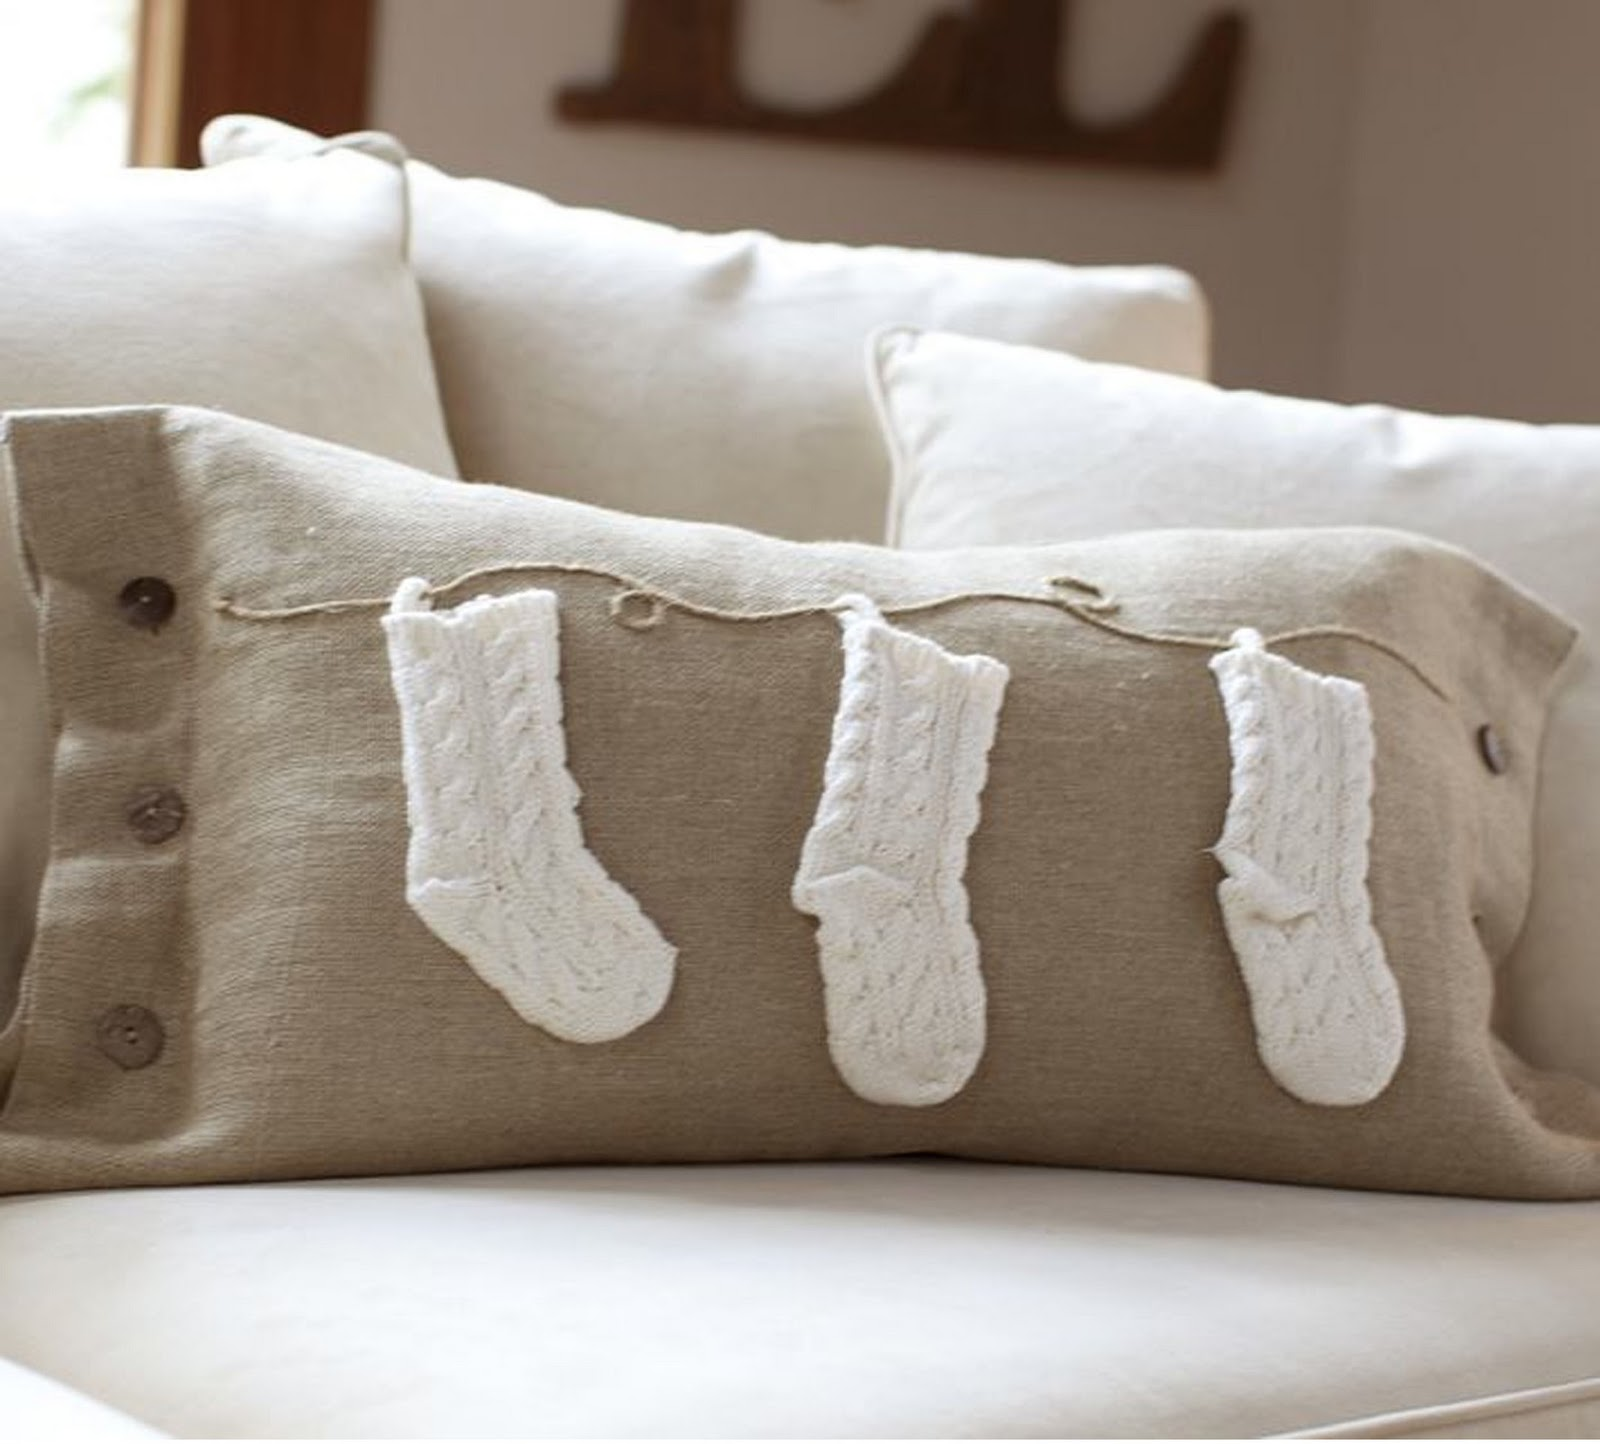 Pottery Barn Pillows: The Little Green Bean: Pottery Barn Pillow Knock Off